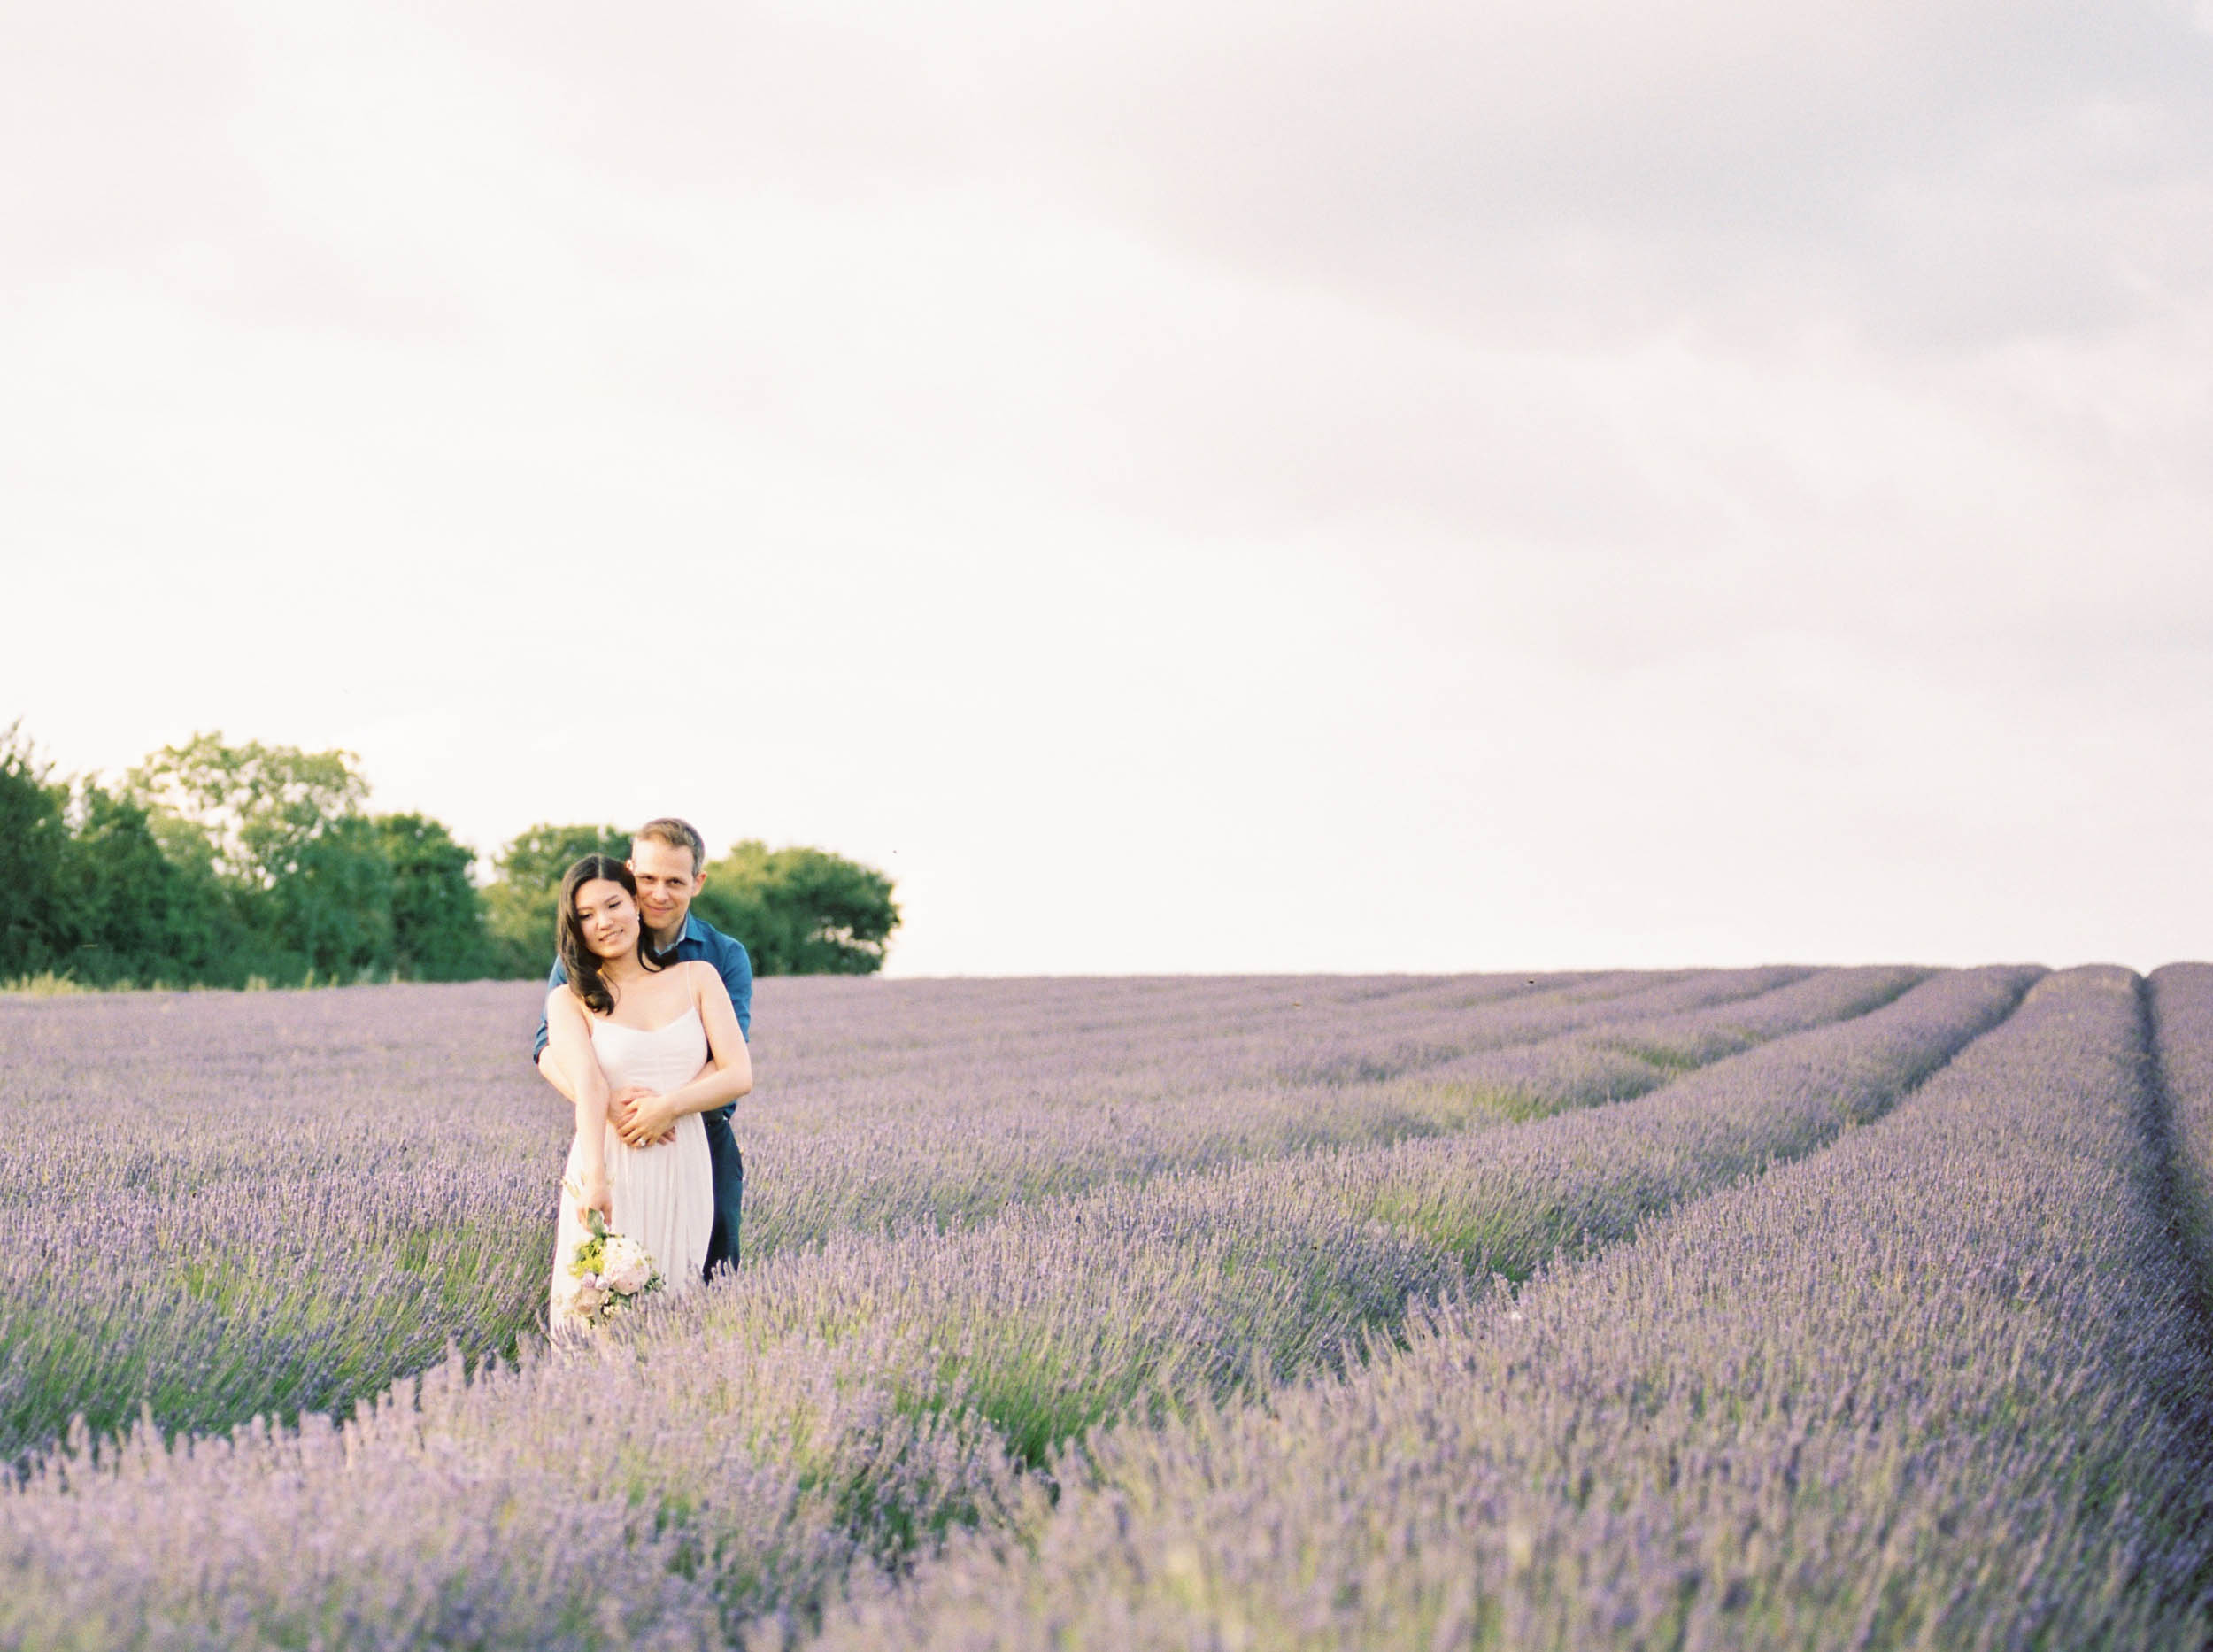 Amy O'Boyle Photography- Destination & UK Fine Art Film Wedding Photographer- Hitchin Lavender Engagement Shoot-14.jpg